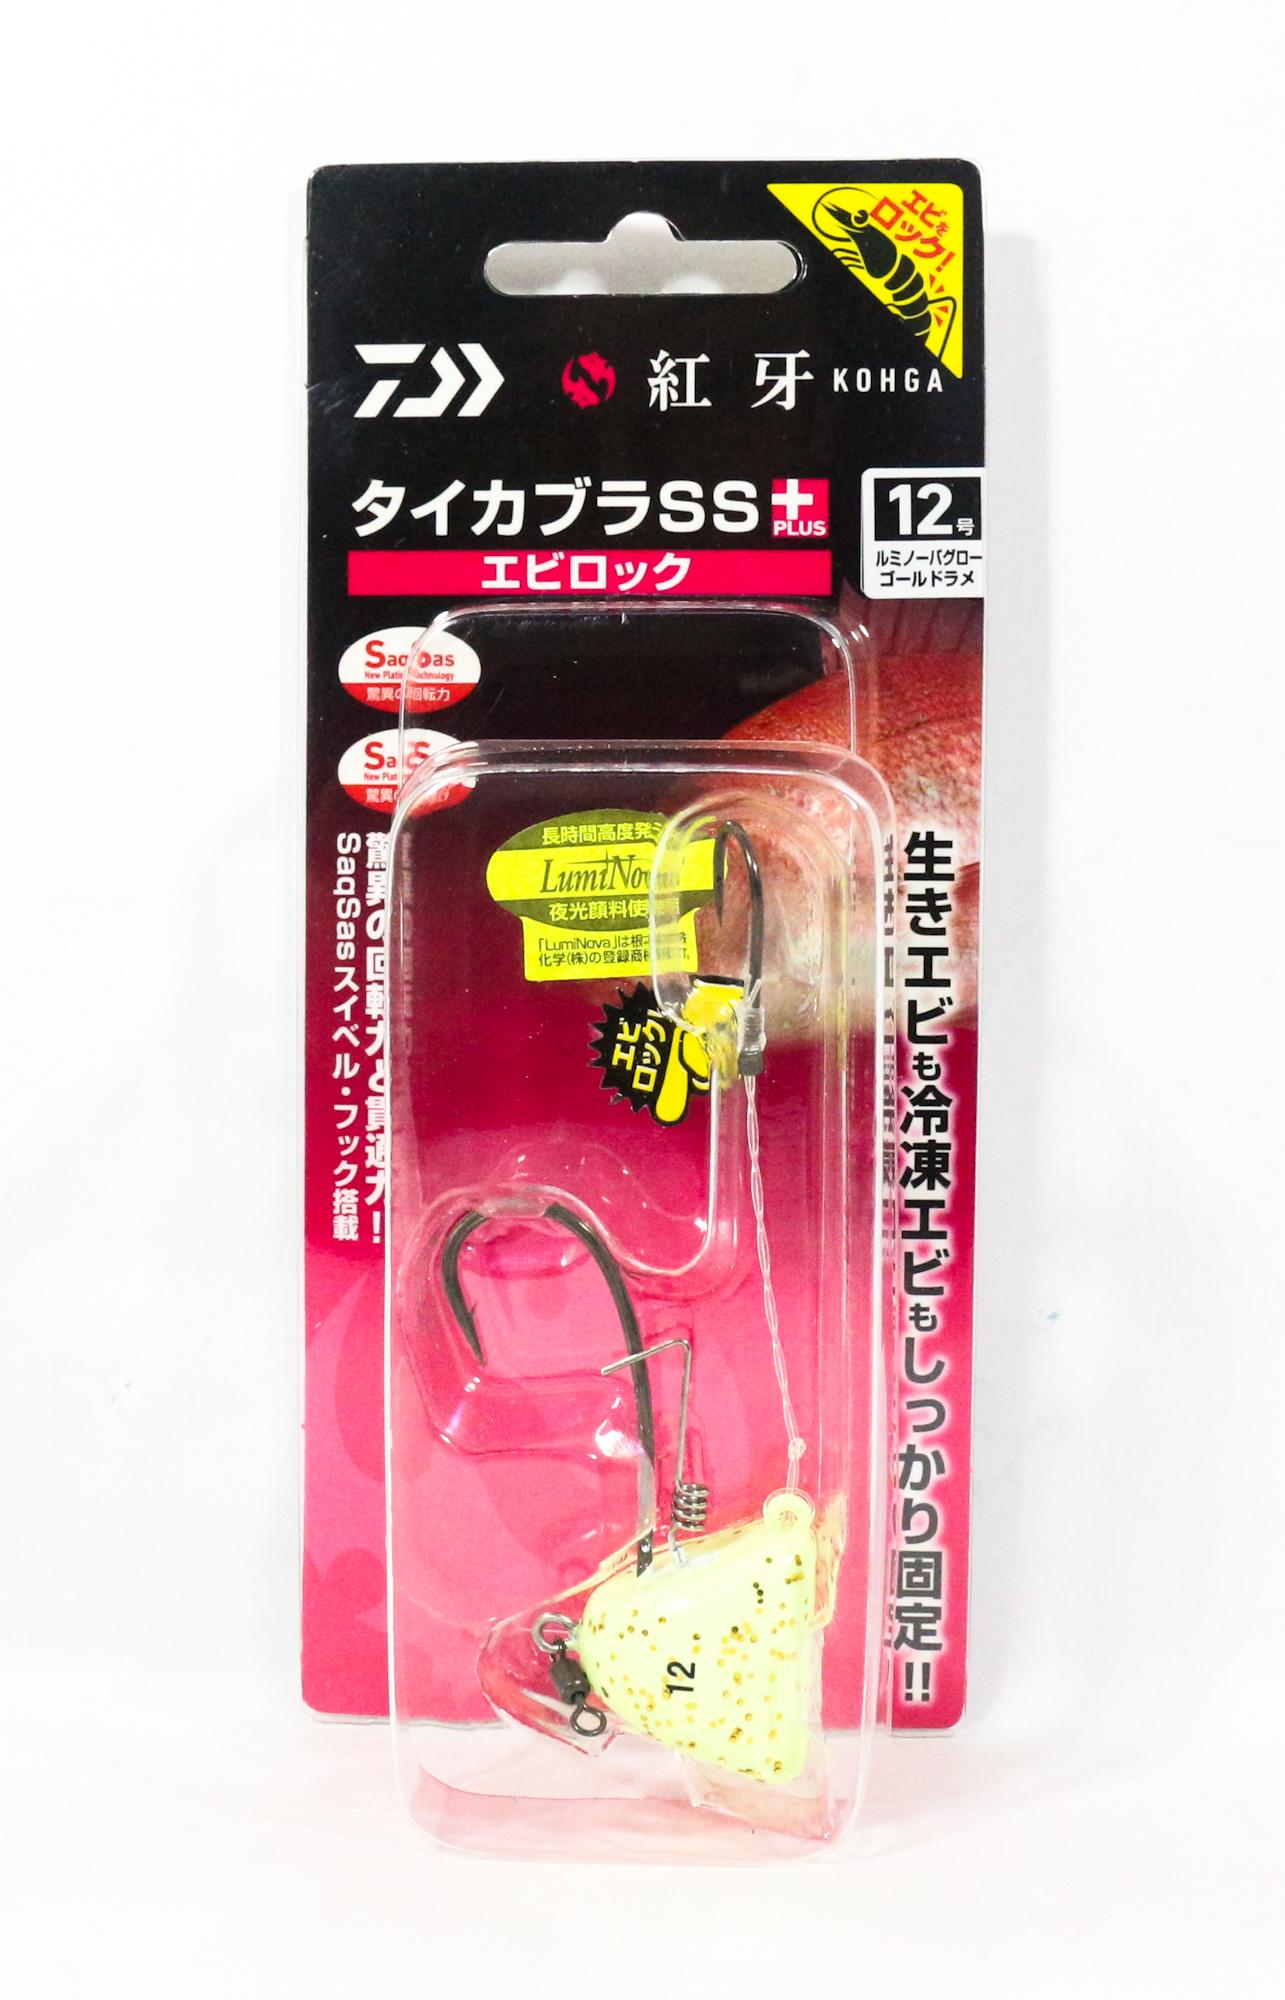 Daiwa Kabura SS+ Tenya Jig Size 12 L GL/GD Flake 003202